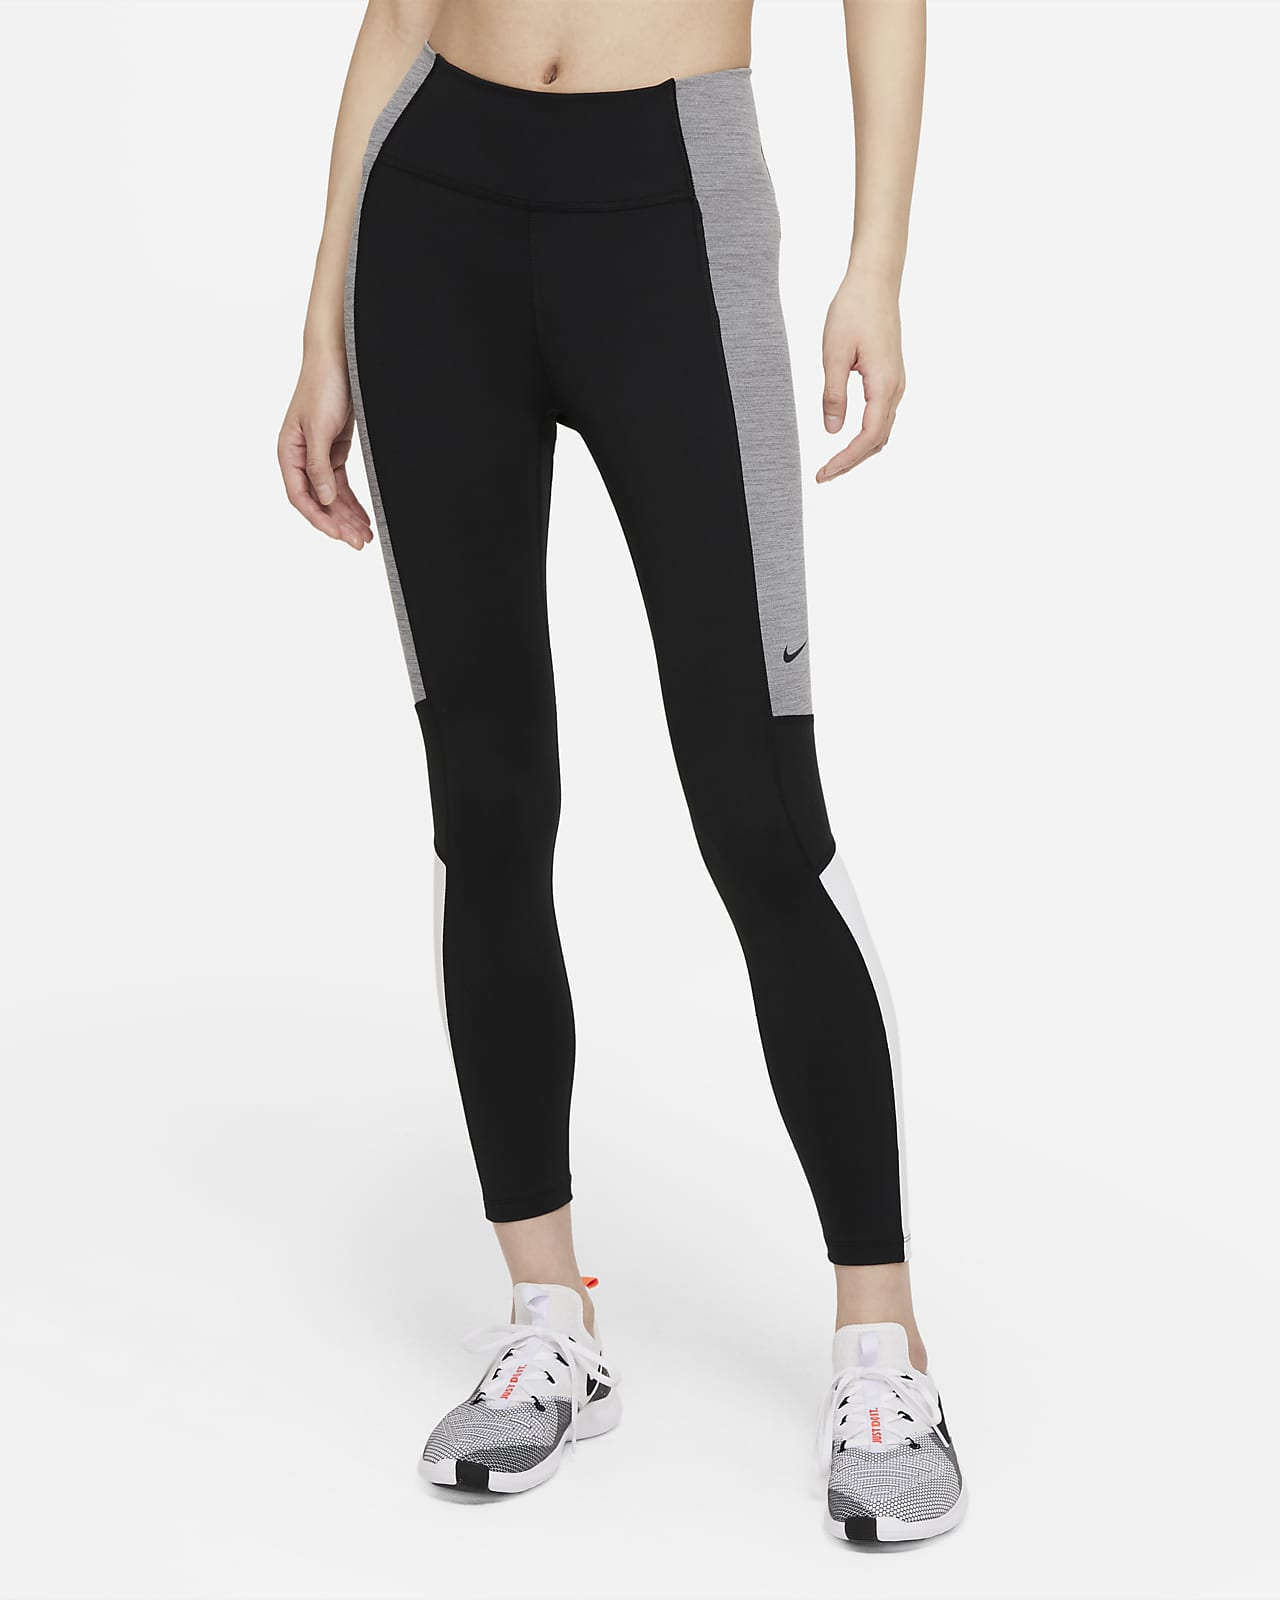 Nike Dri-FIT One 女款中腰色塊九分內搭褲